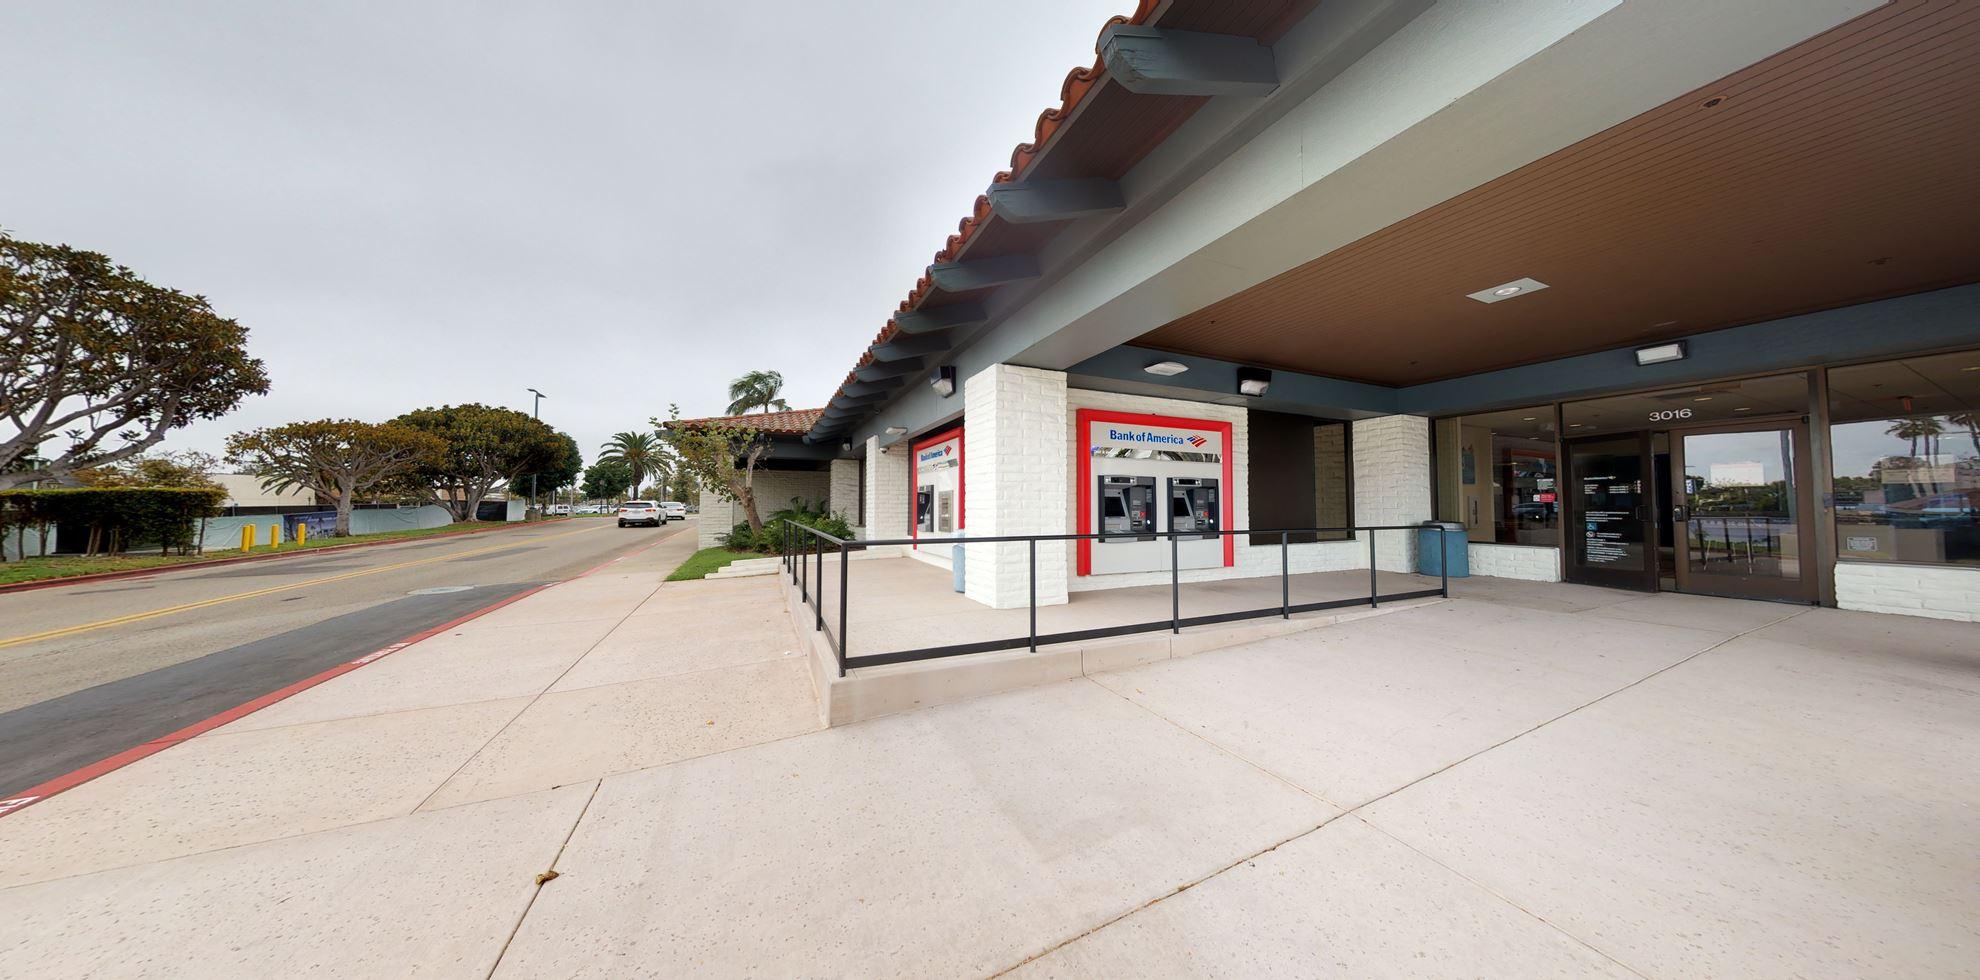 Bank of America financial center with drive-thru ATM | 3016 N Sepulveda Blvd, Manhattan Beach, CA 90266